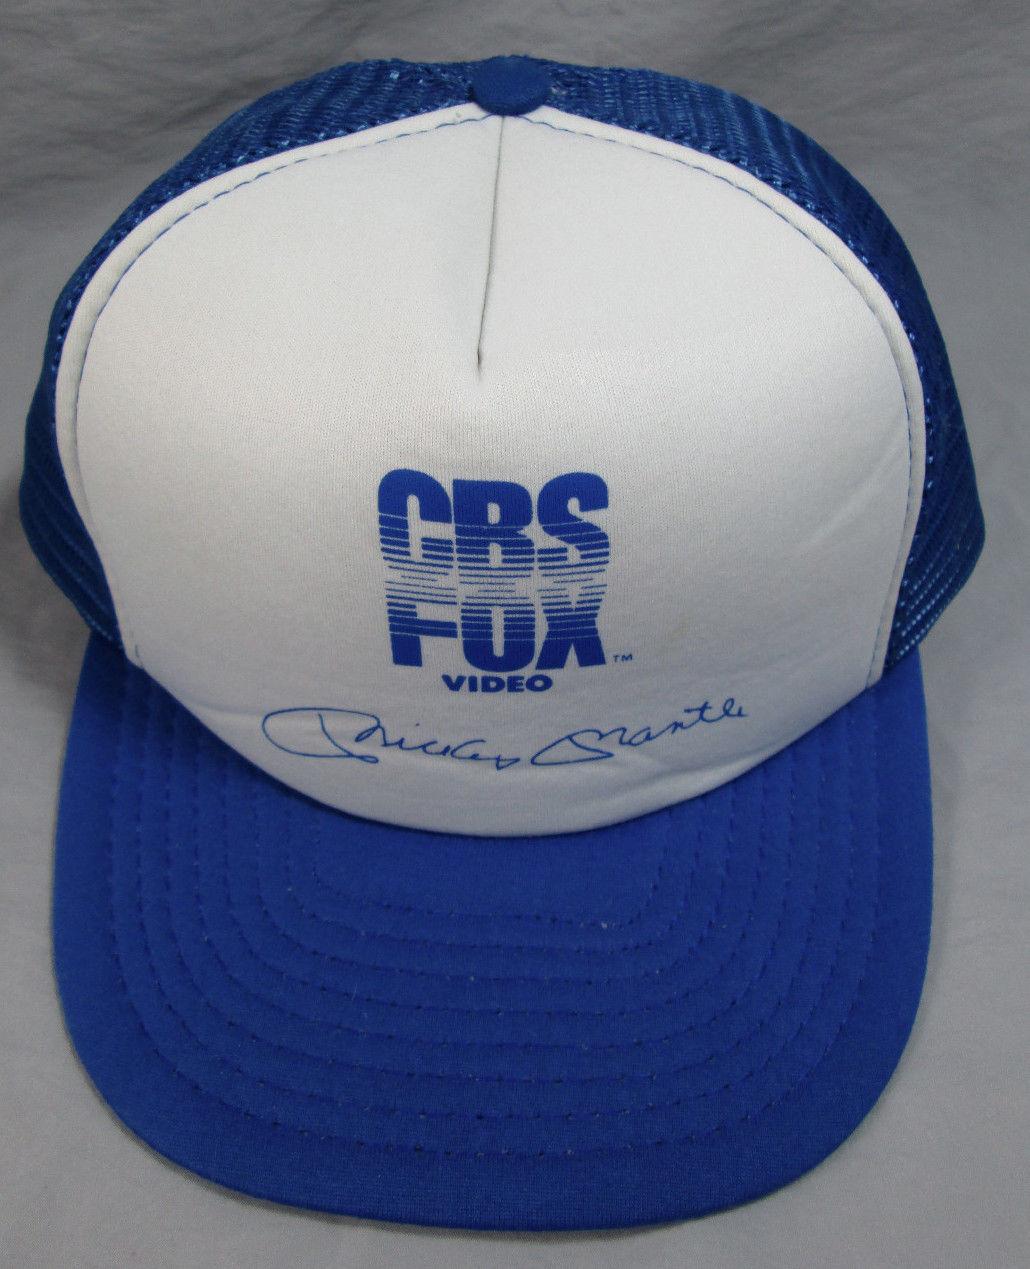 1986 cbs/fox videos